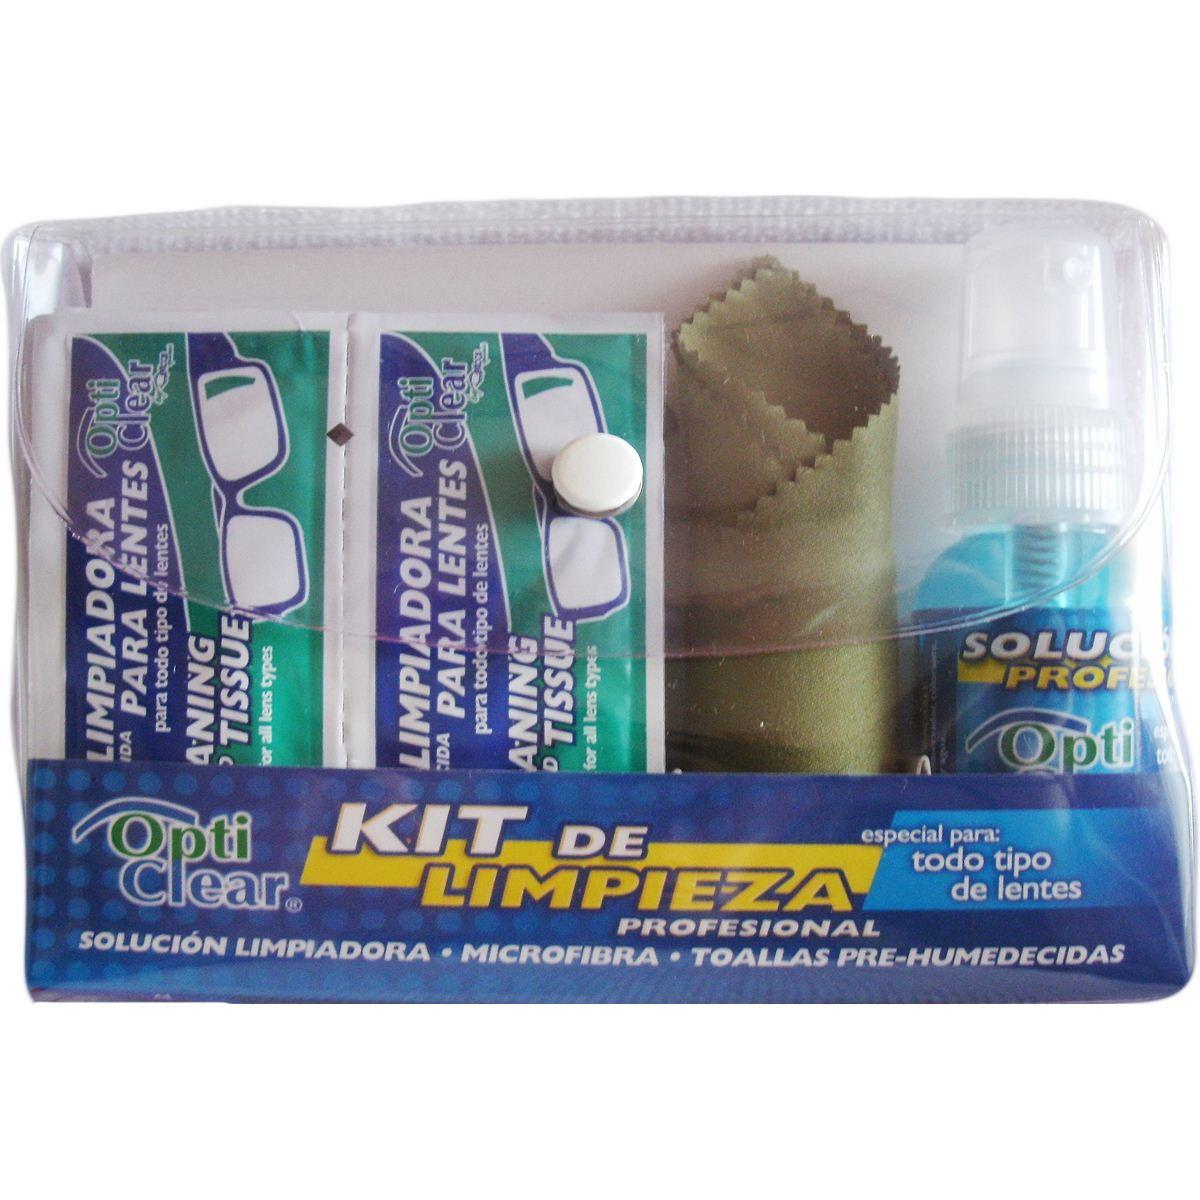 Kit de limpieza Opti Clear